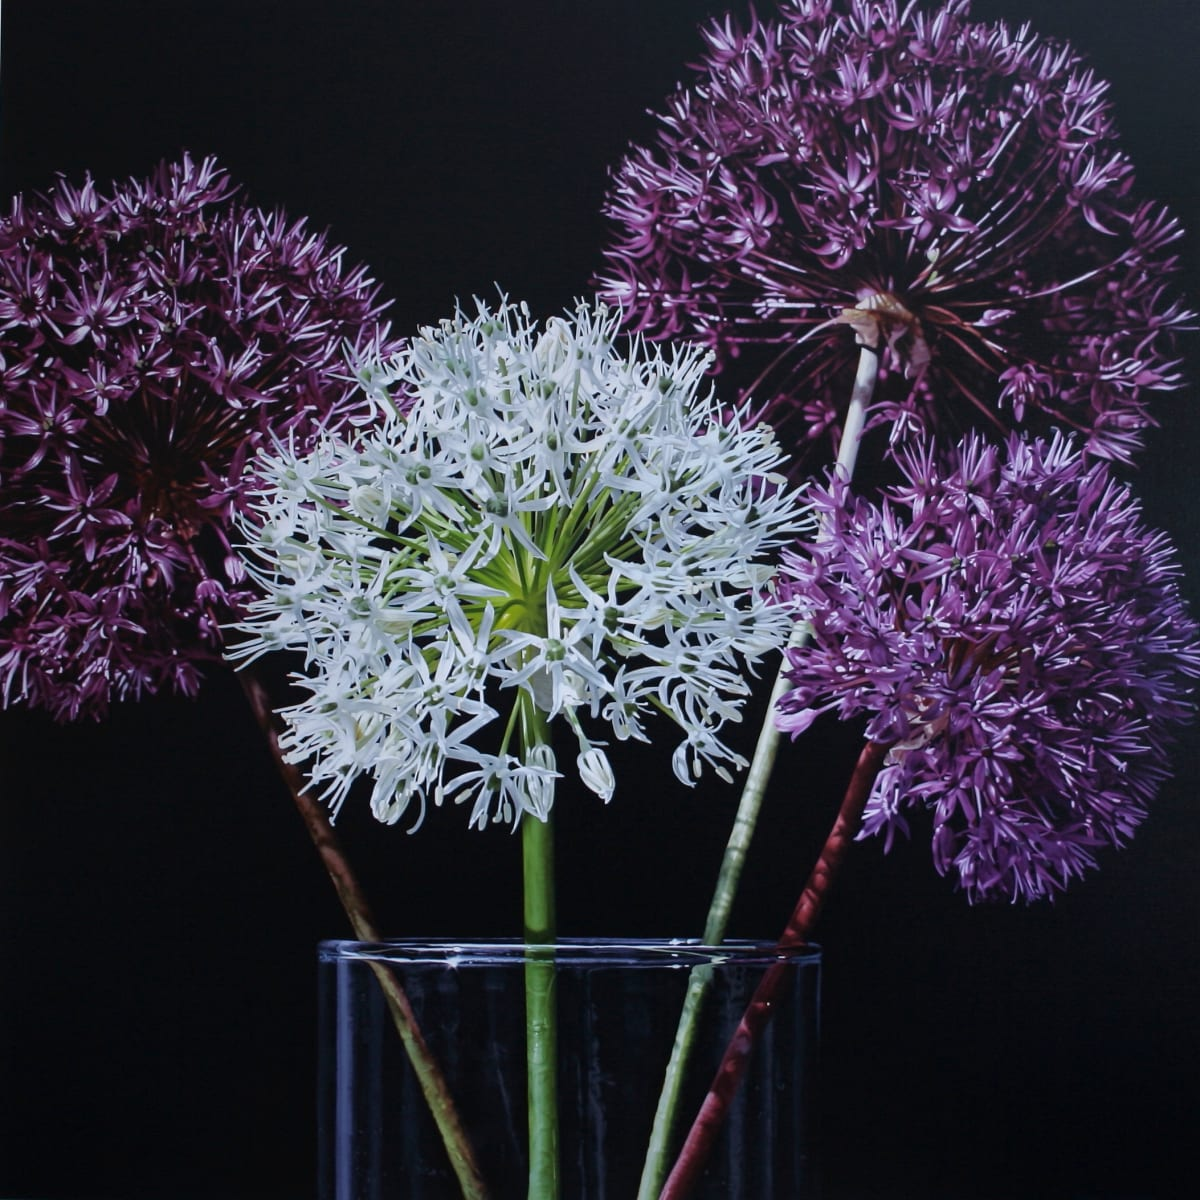 Glen Semple A Little Bit of Allium Acrylic on canvas 120 x 120 cm